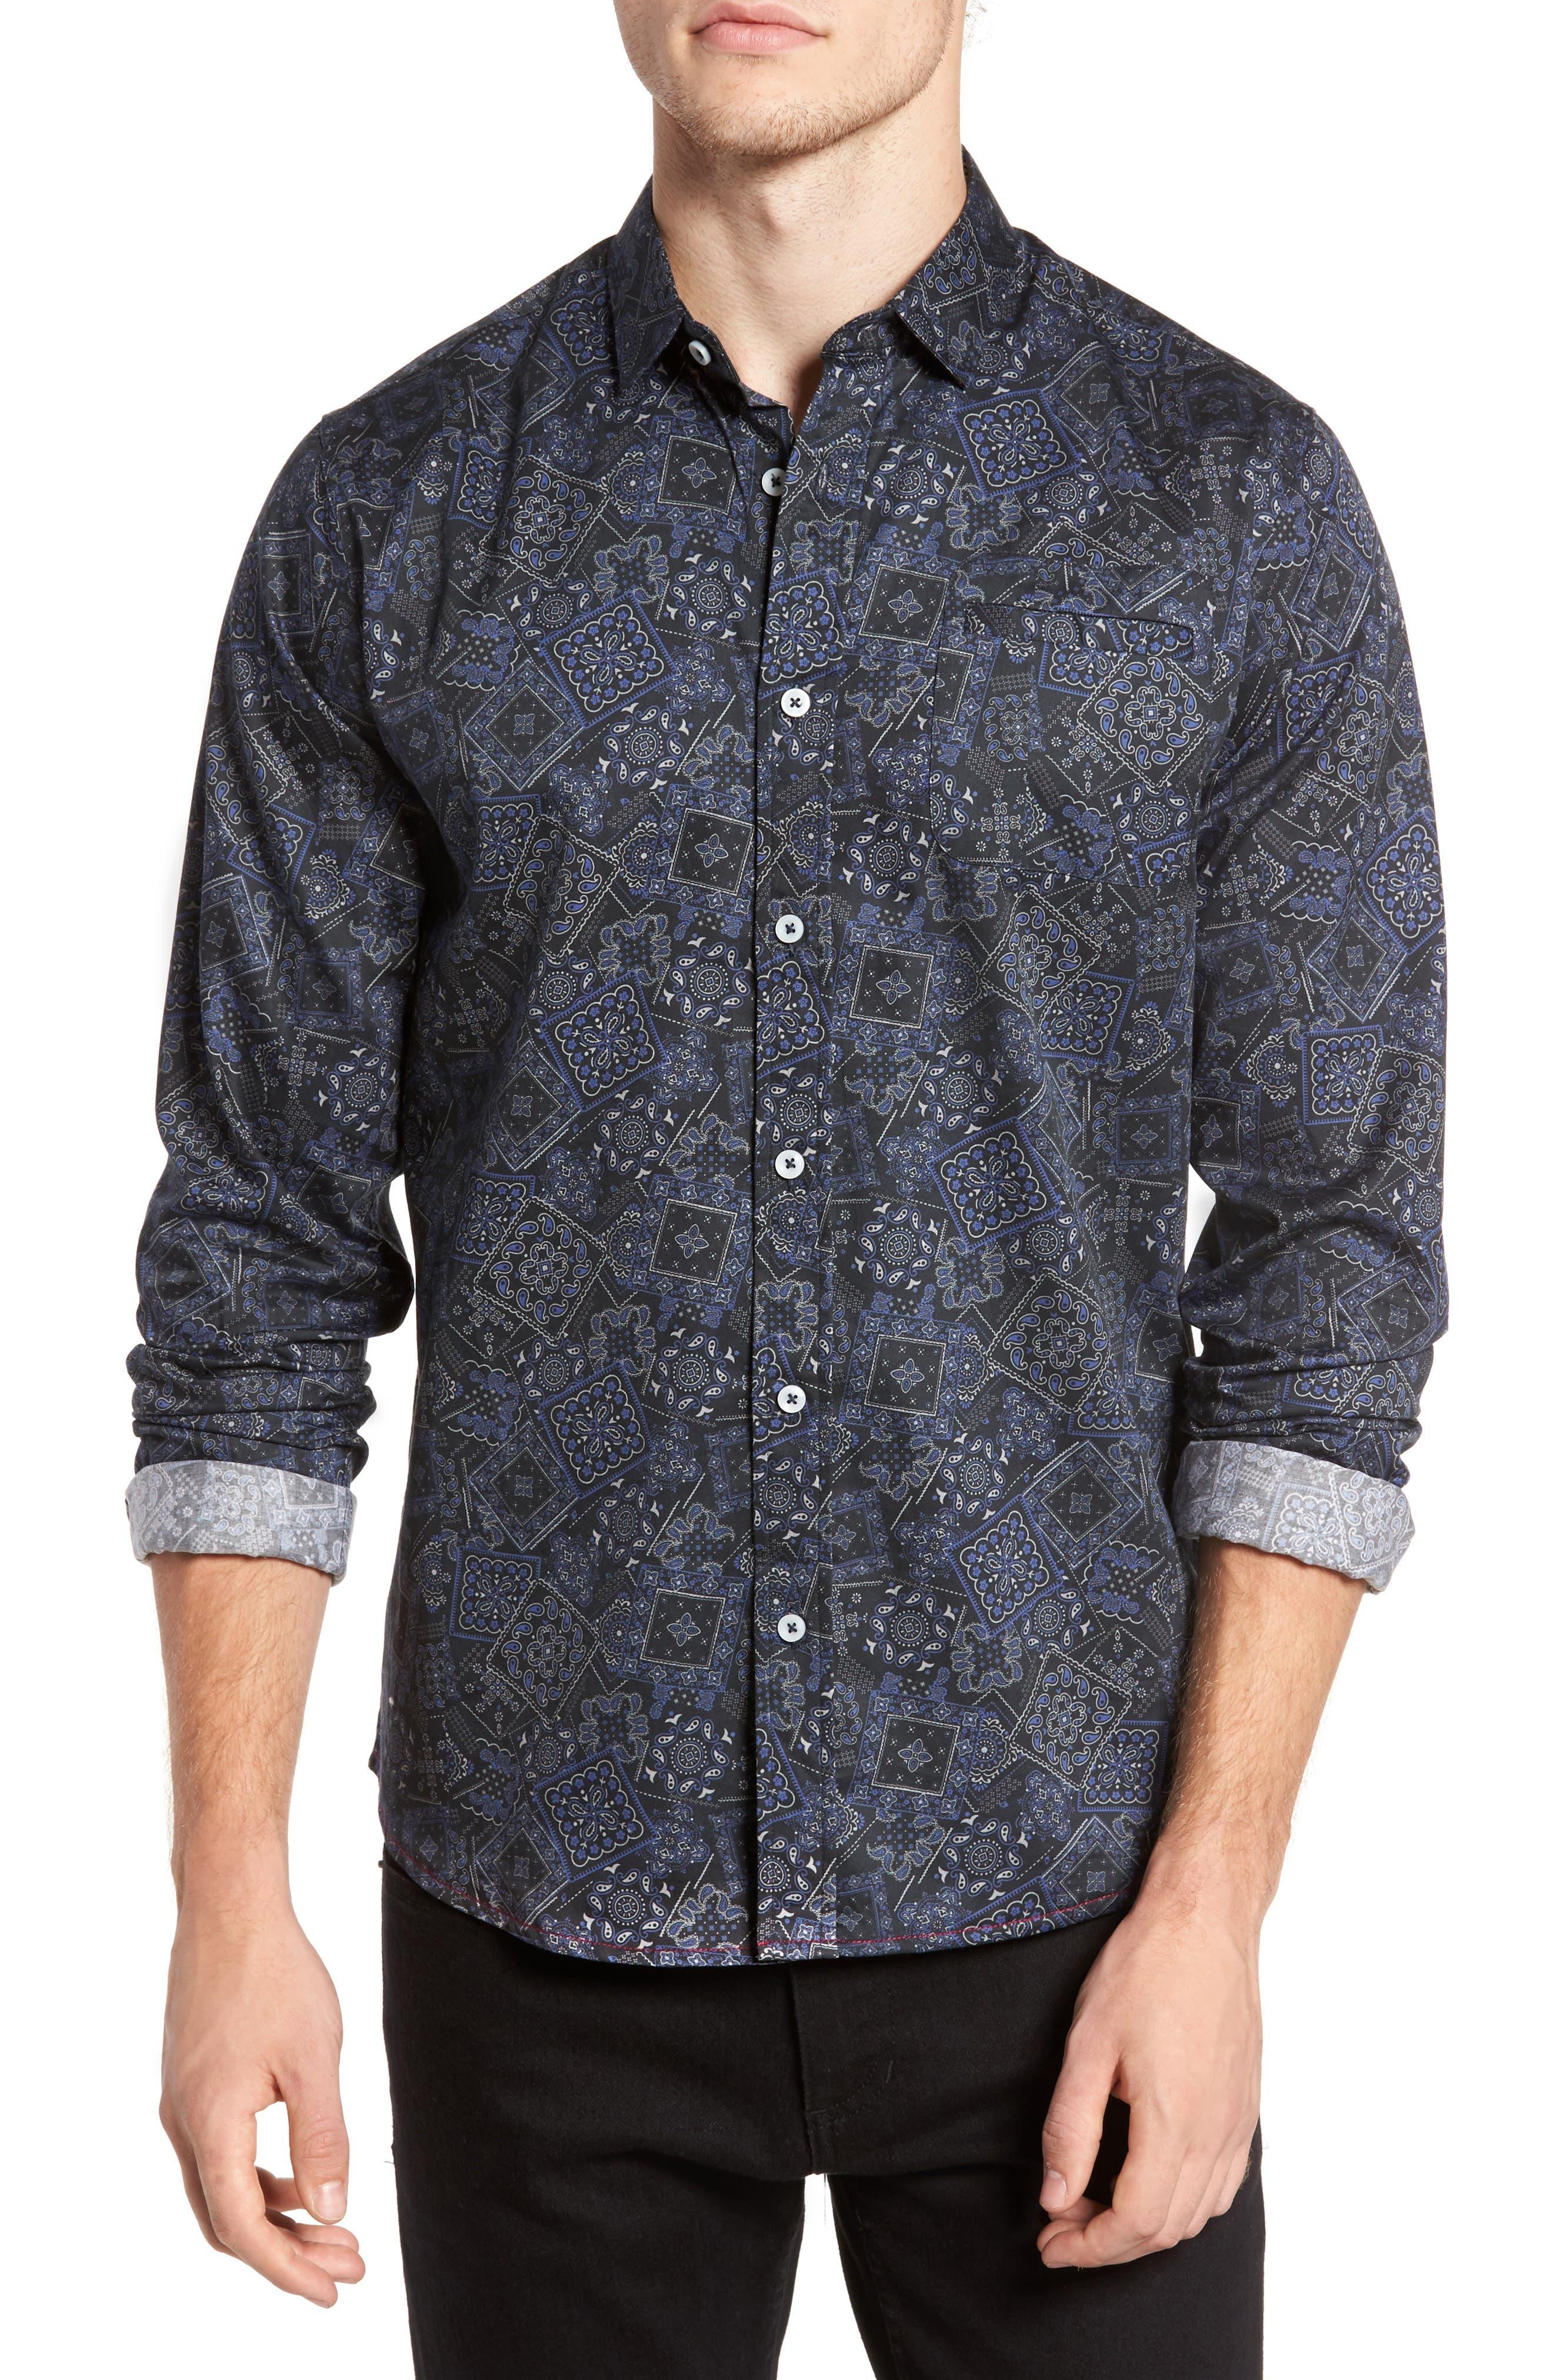 Main Image - Descendant of Thieves Bandana Woven Shirt